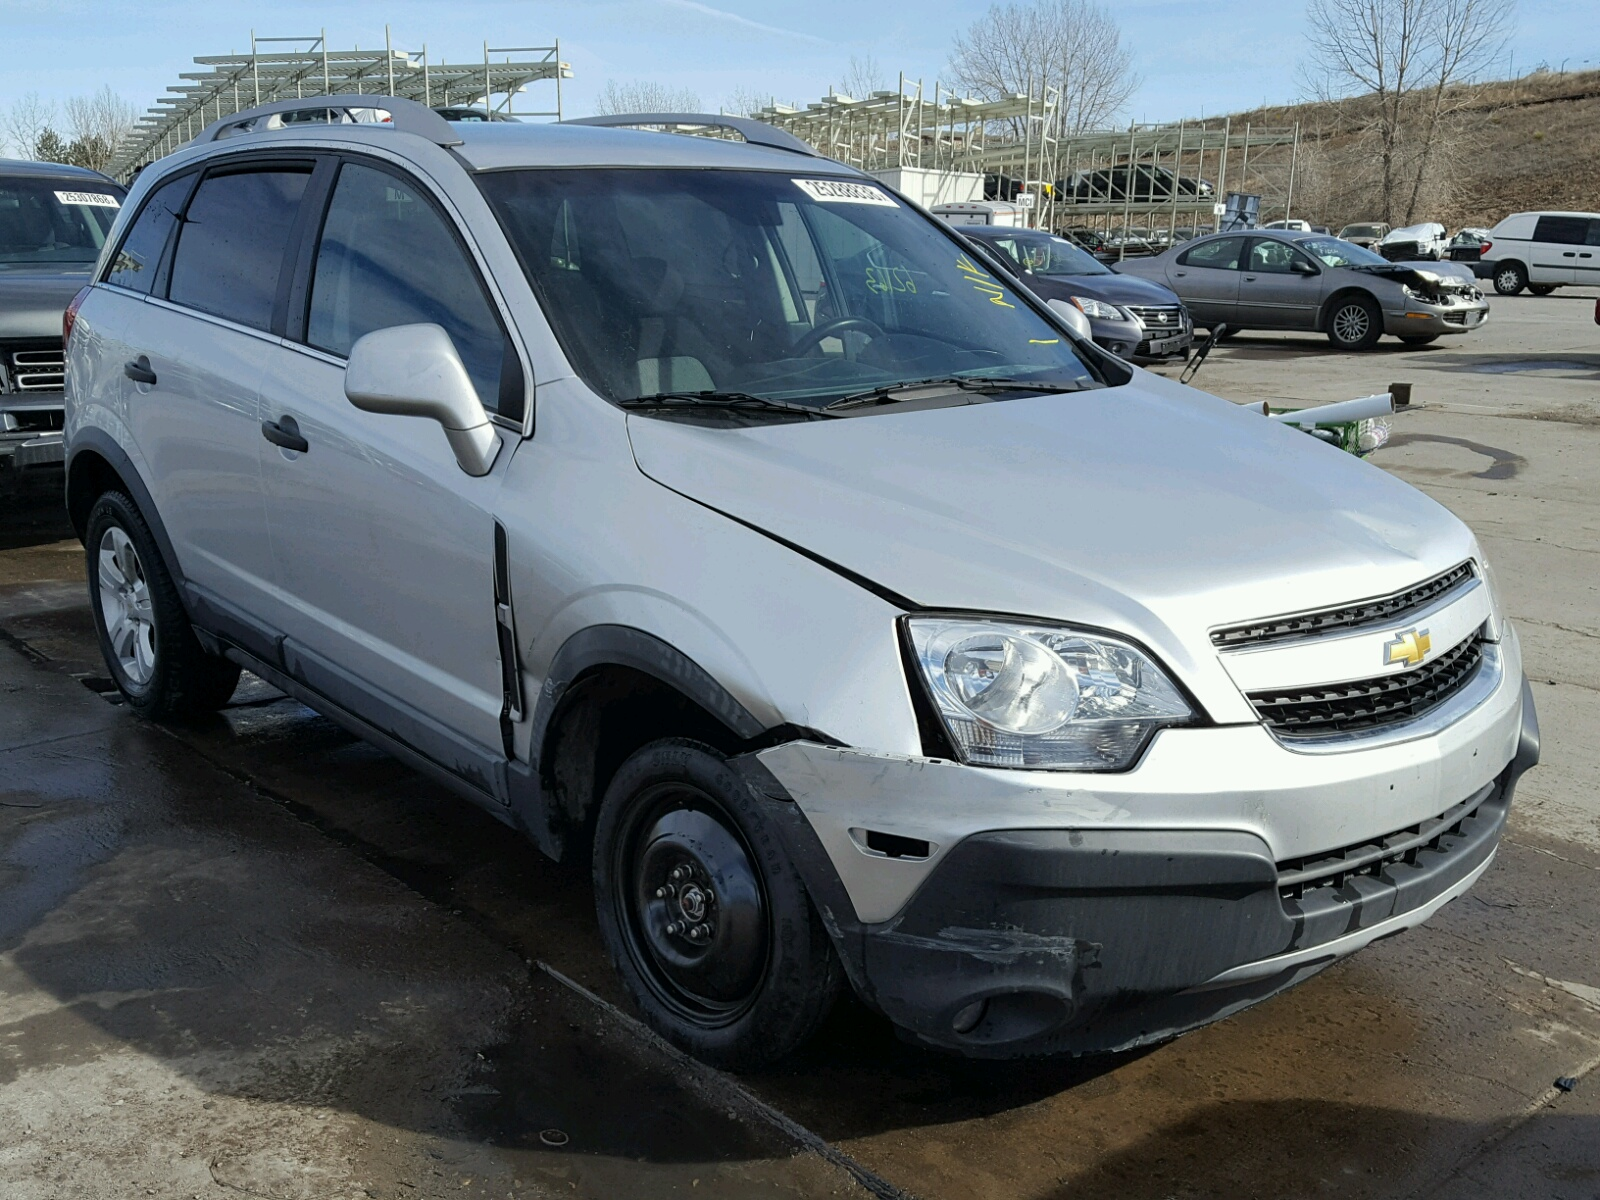 Auto Auction Ended On Vin 3gnal3ek5es618977 2014 Chevrolet Captiva Lt In Fl Miami Central